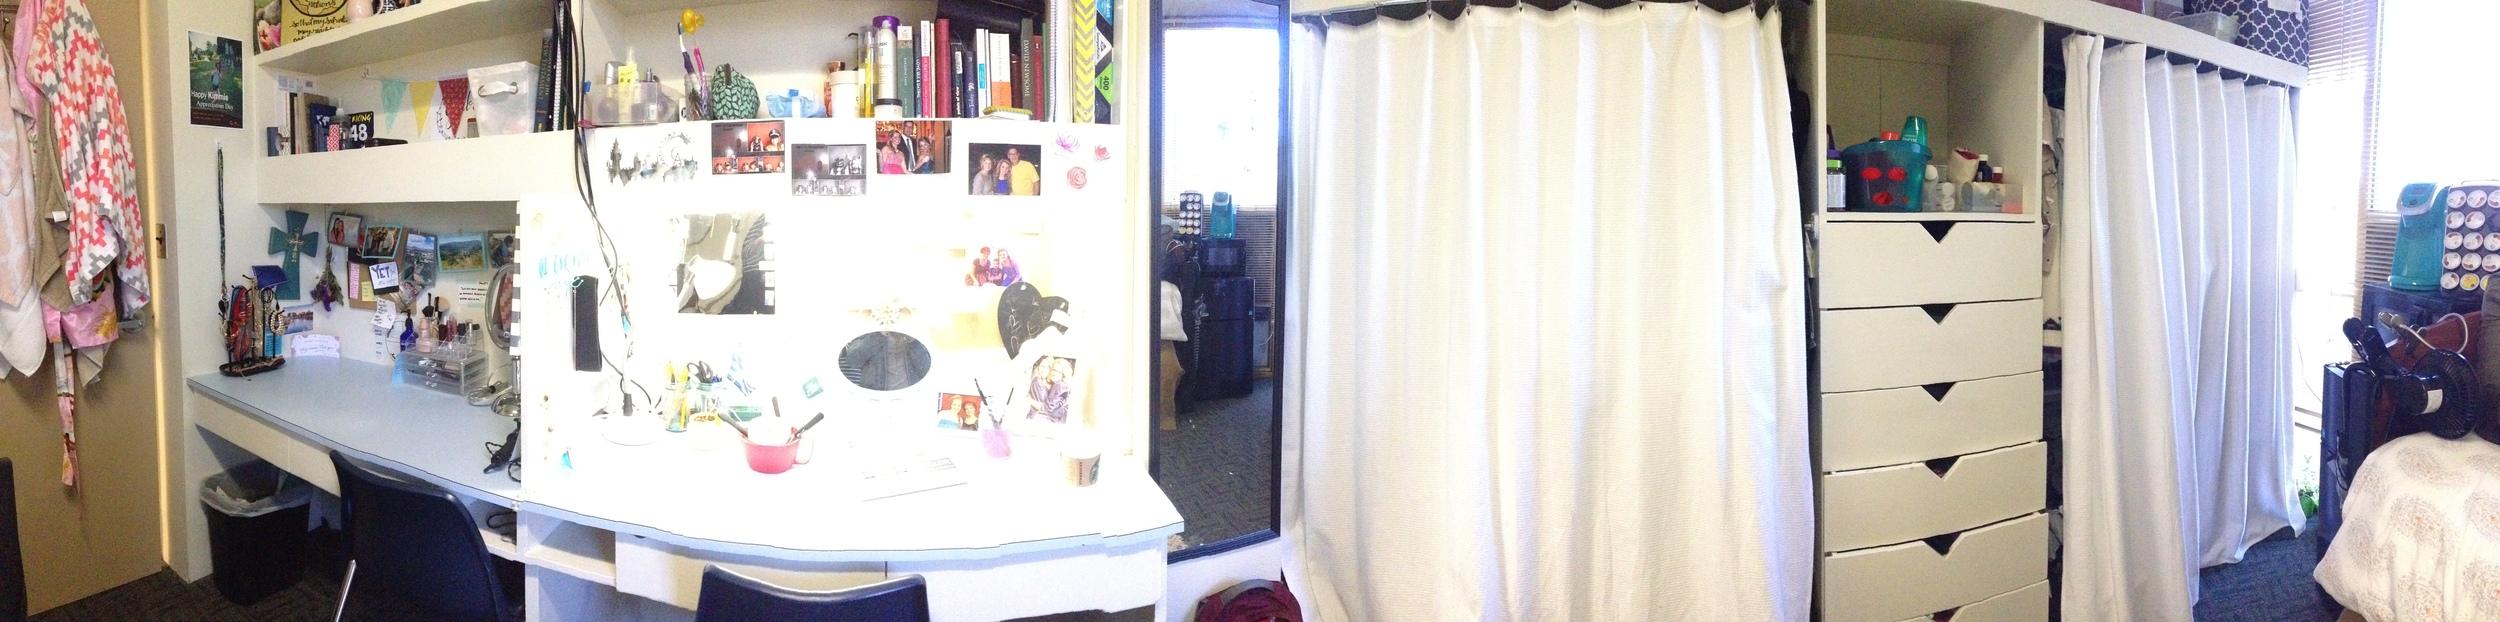 tour-my-tiny-college-dorm.jpg